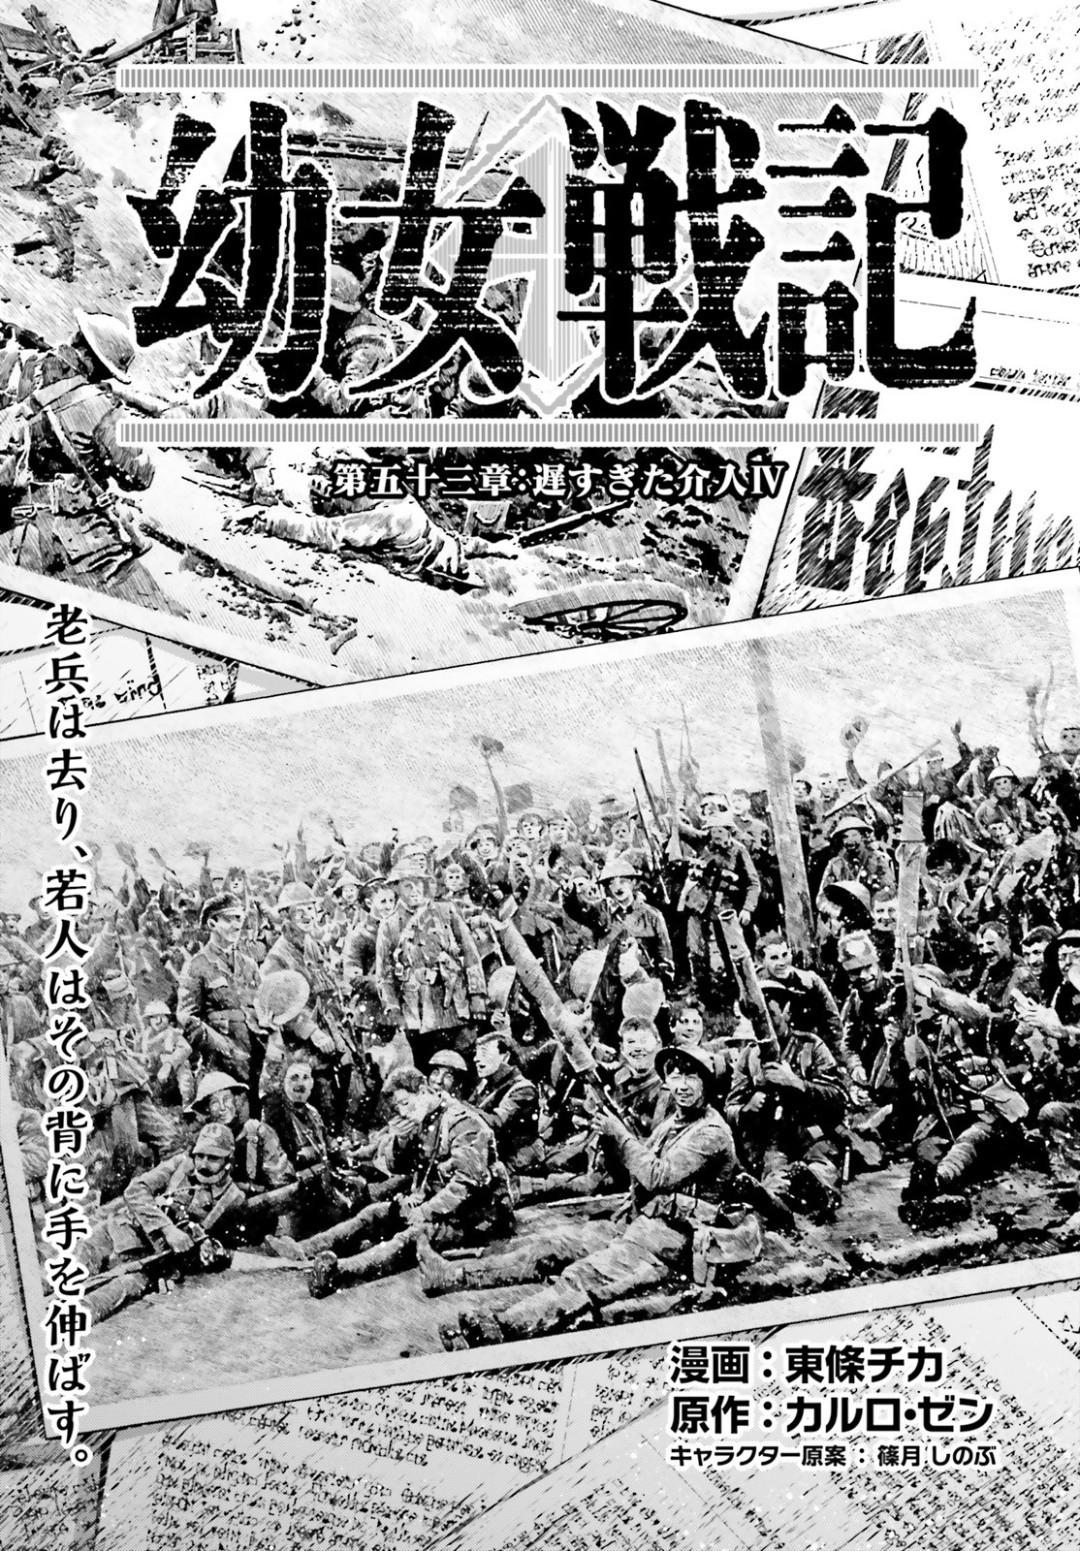 Youjo Senki - Chapter 53 - Page 1